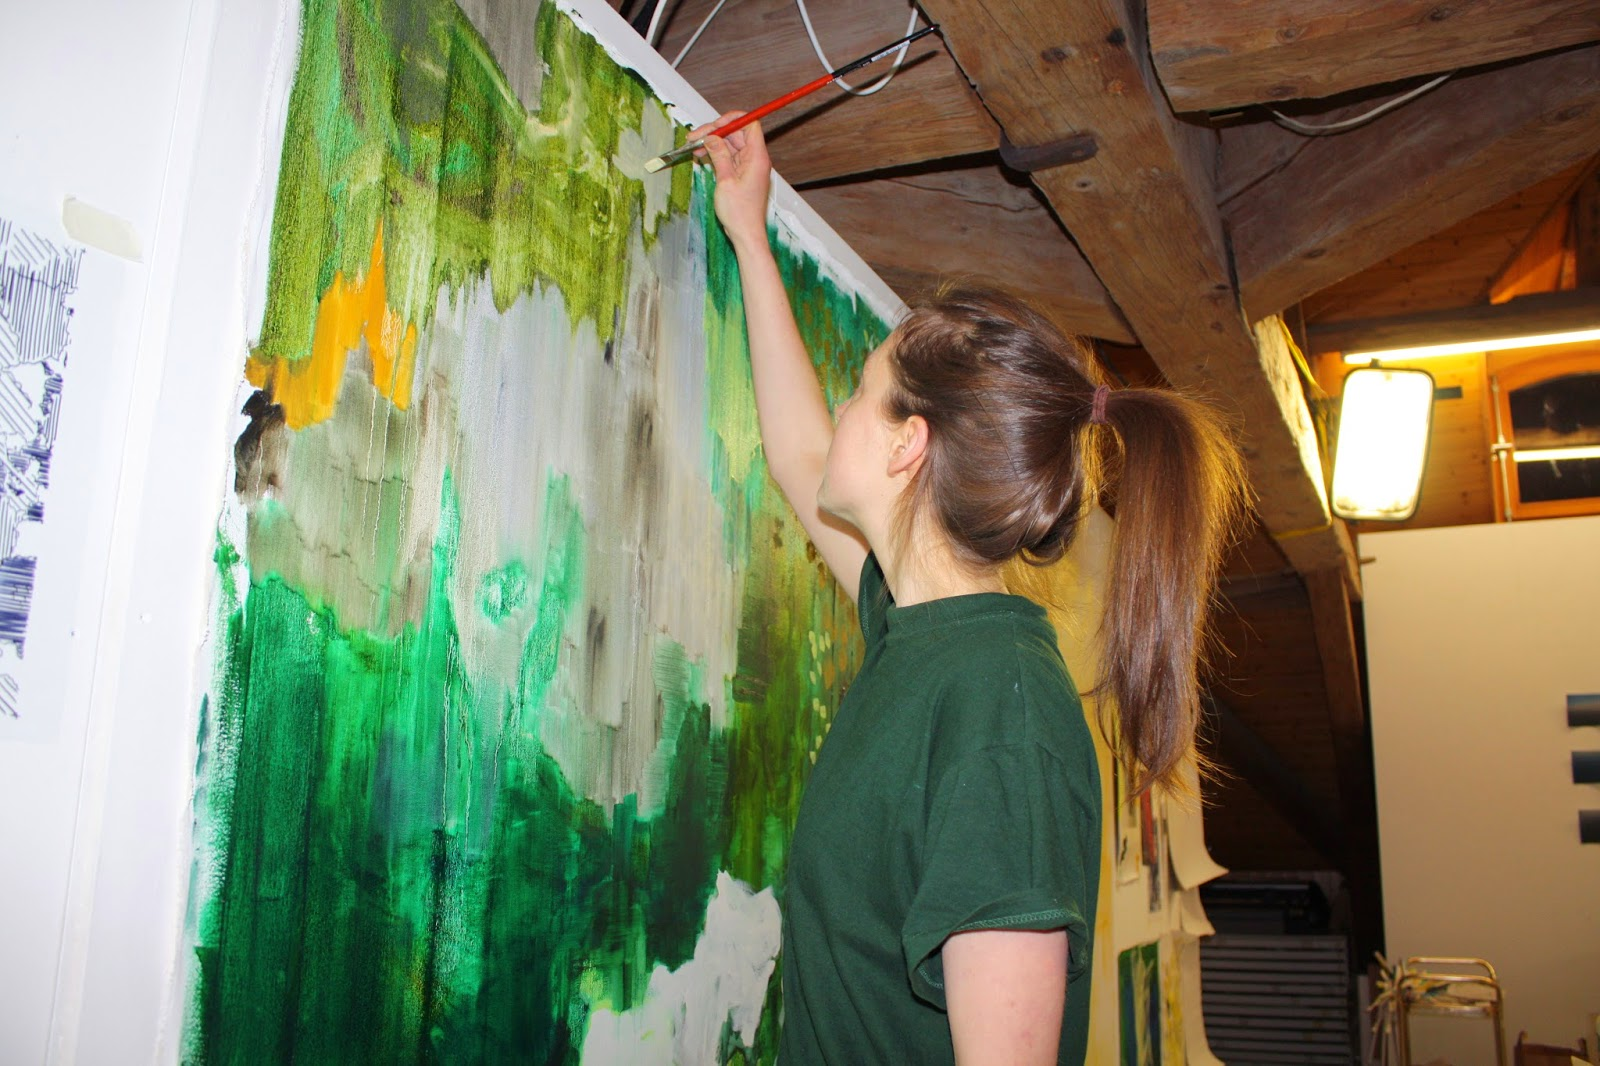 Abigail Box in the Trélex studio making paintings